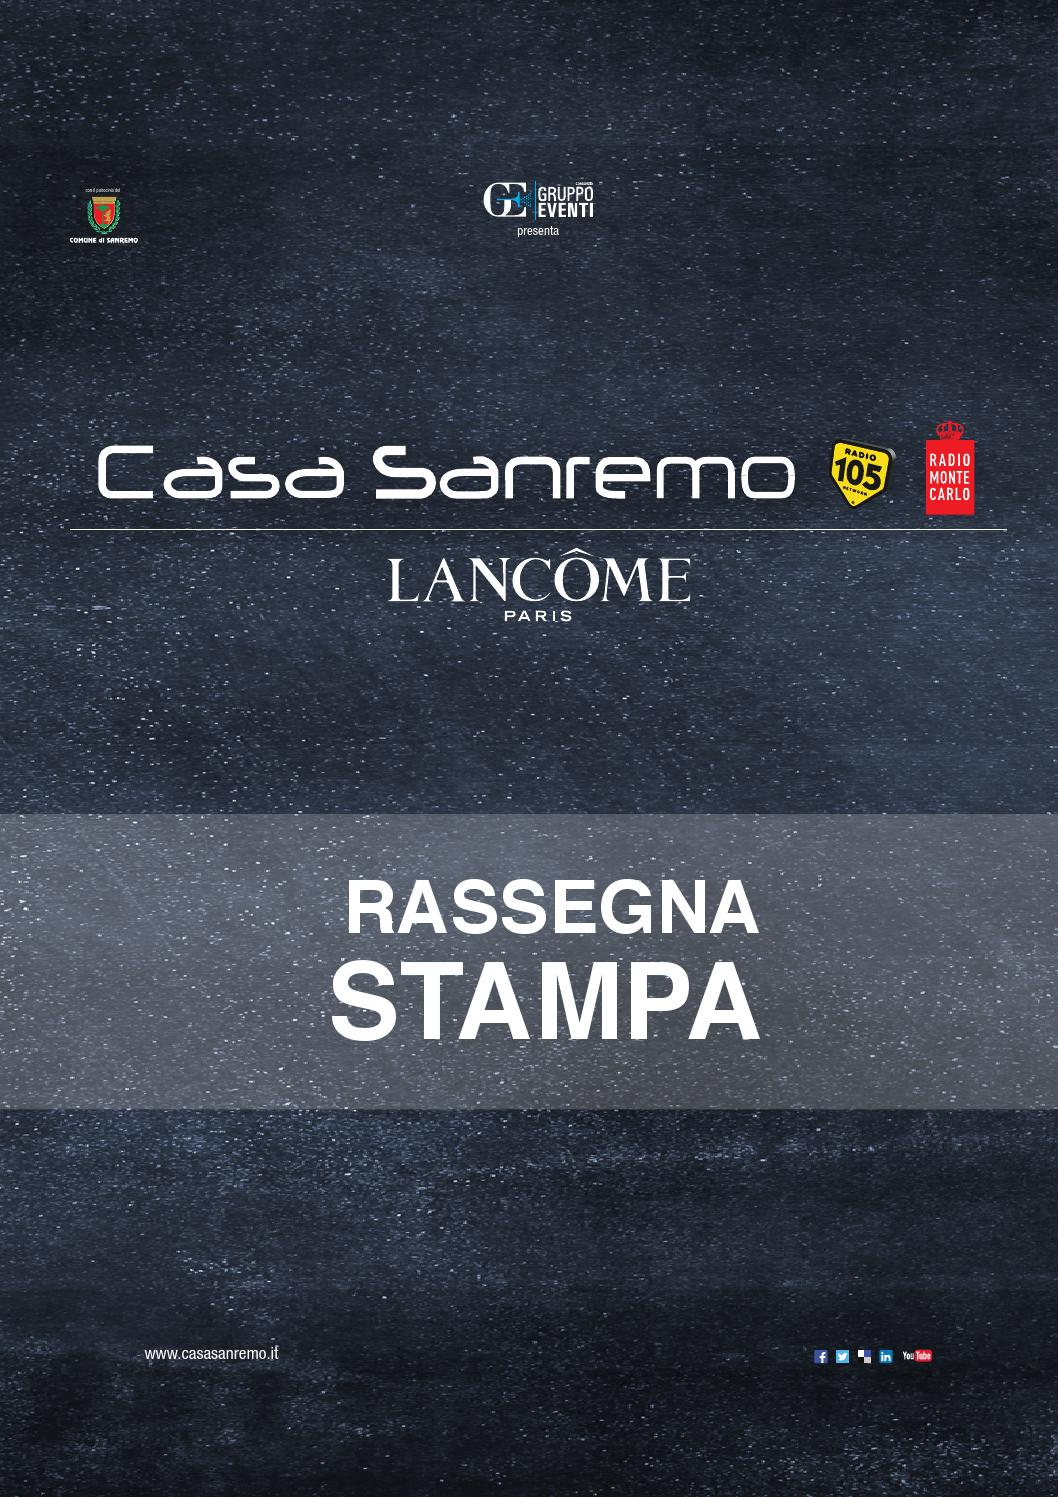 Casa Sanremo Lancôme - Rassegna Stampa 2015 by Consorzio Gruppo Eventi -  issuu 25750a8c70c